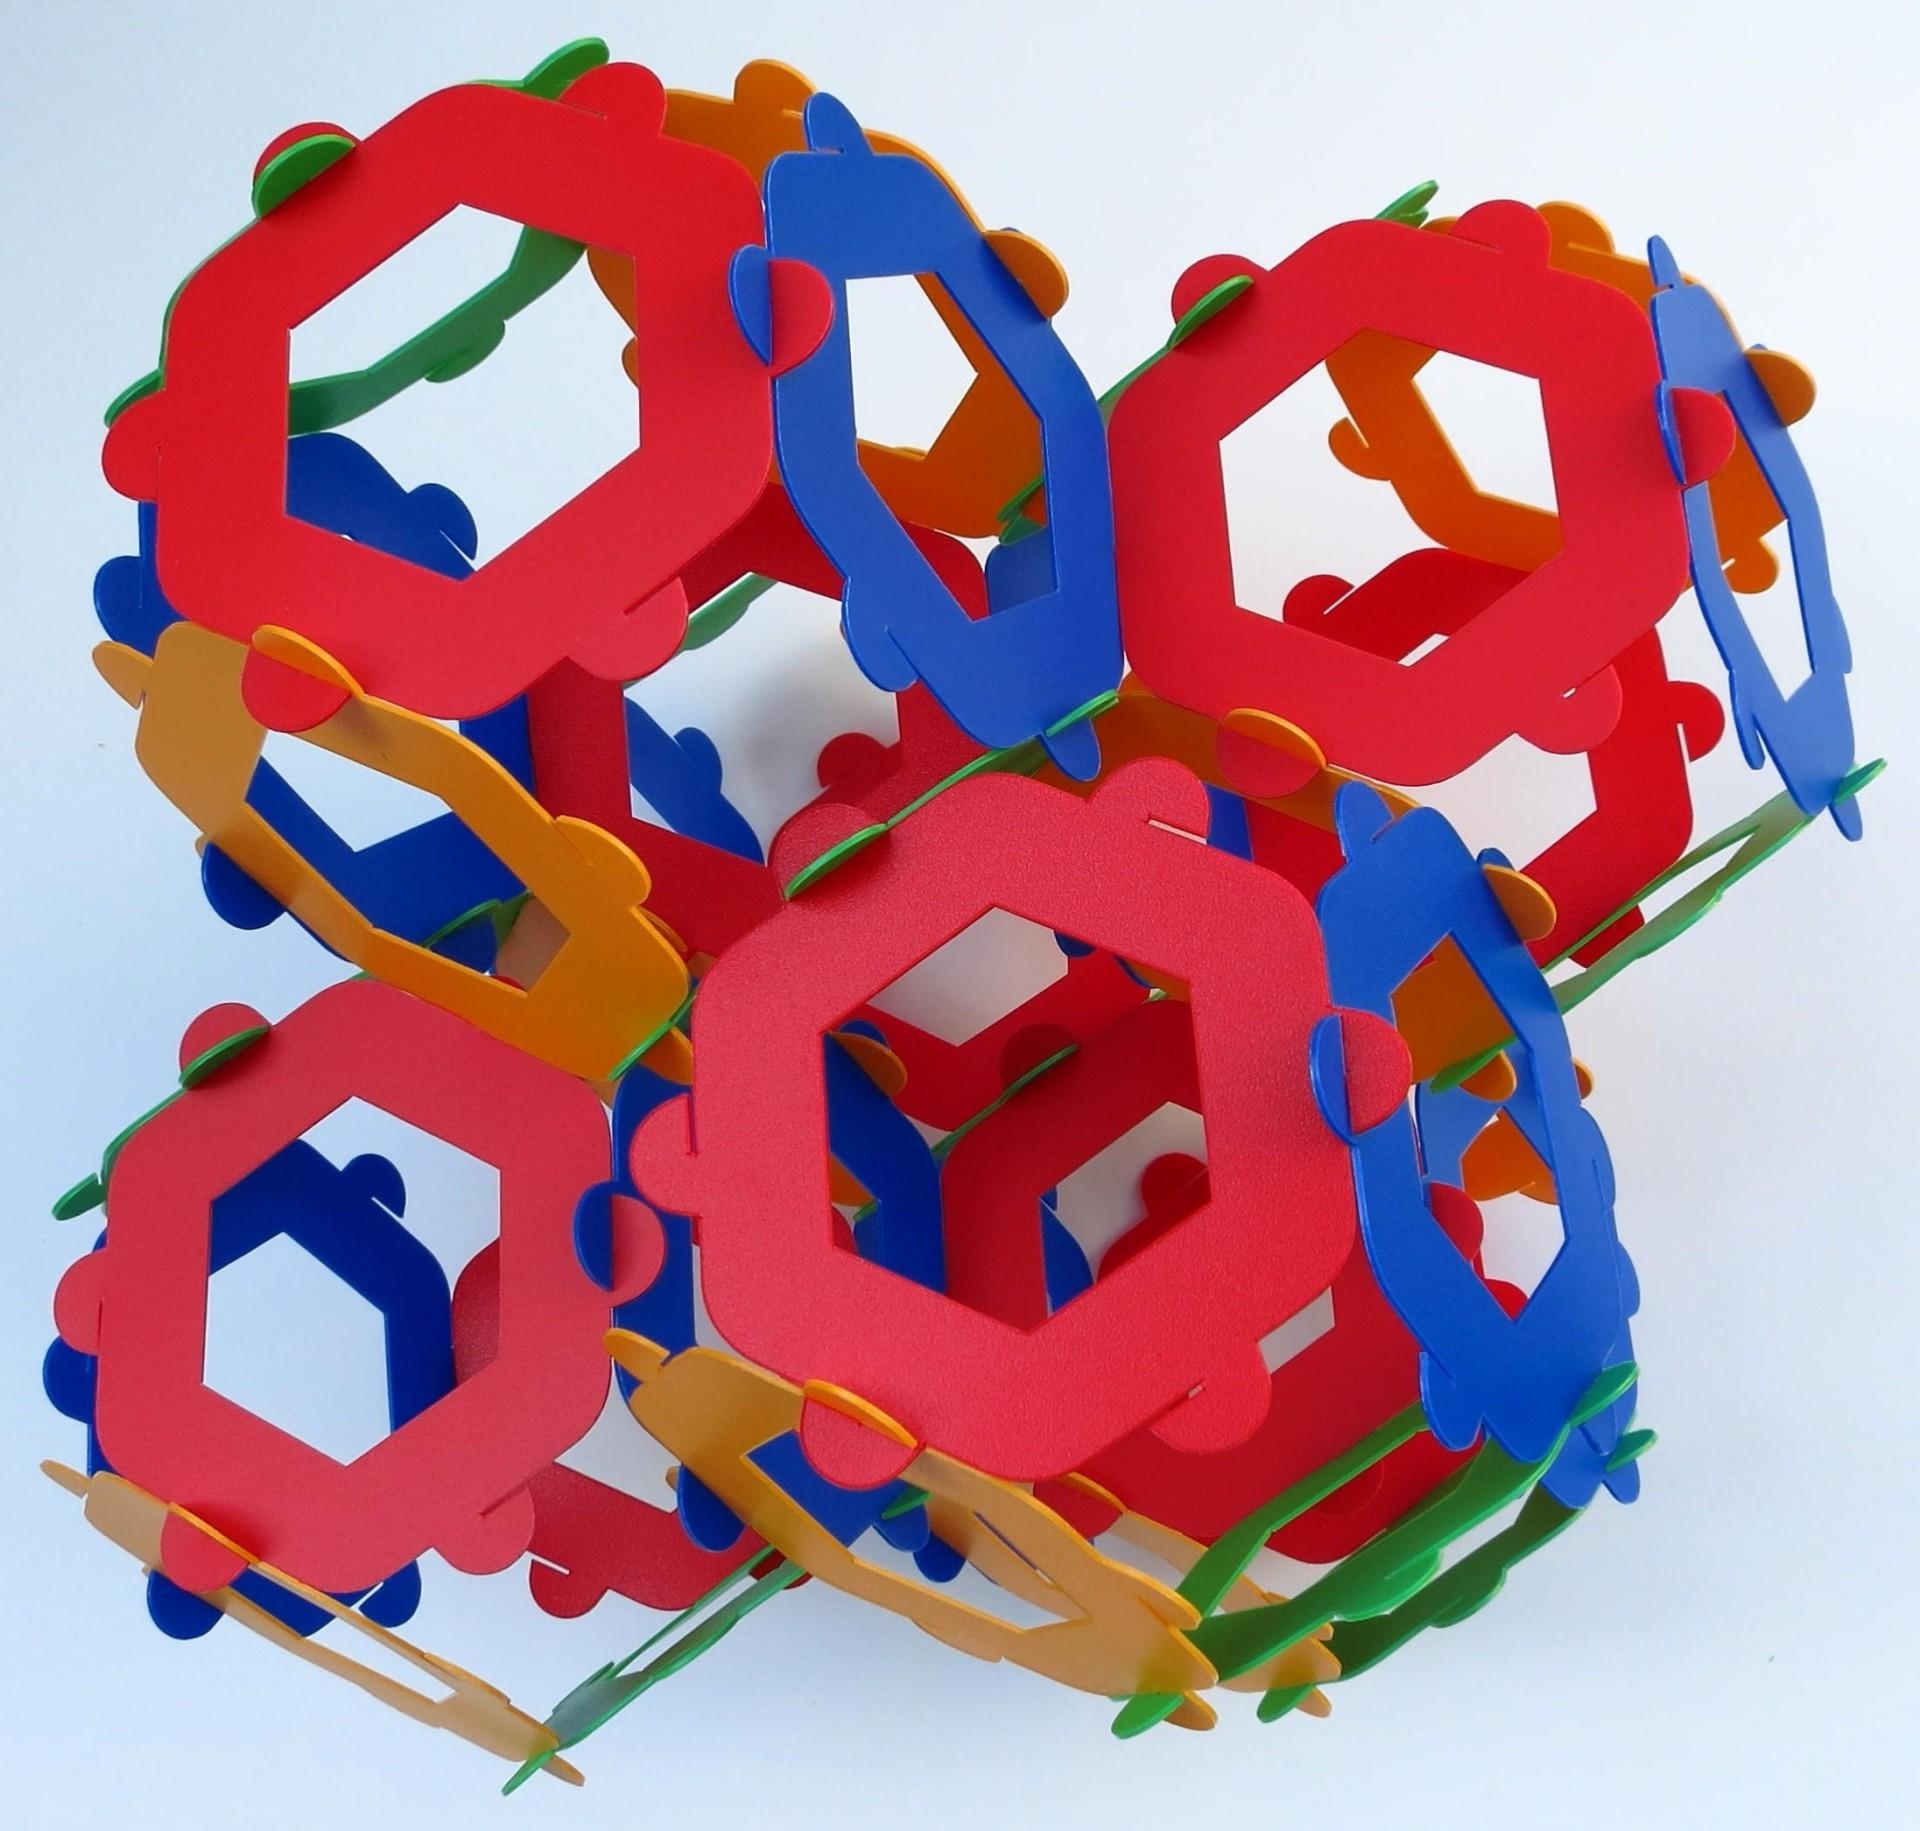 Muoctahedron